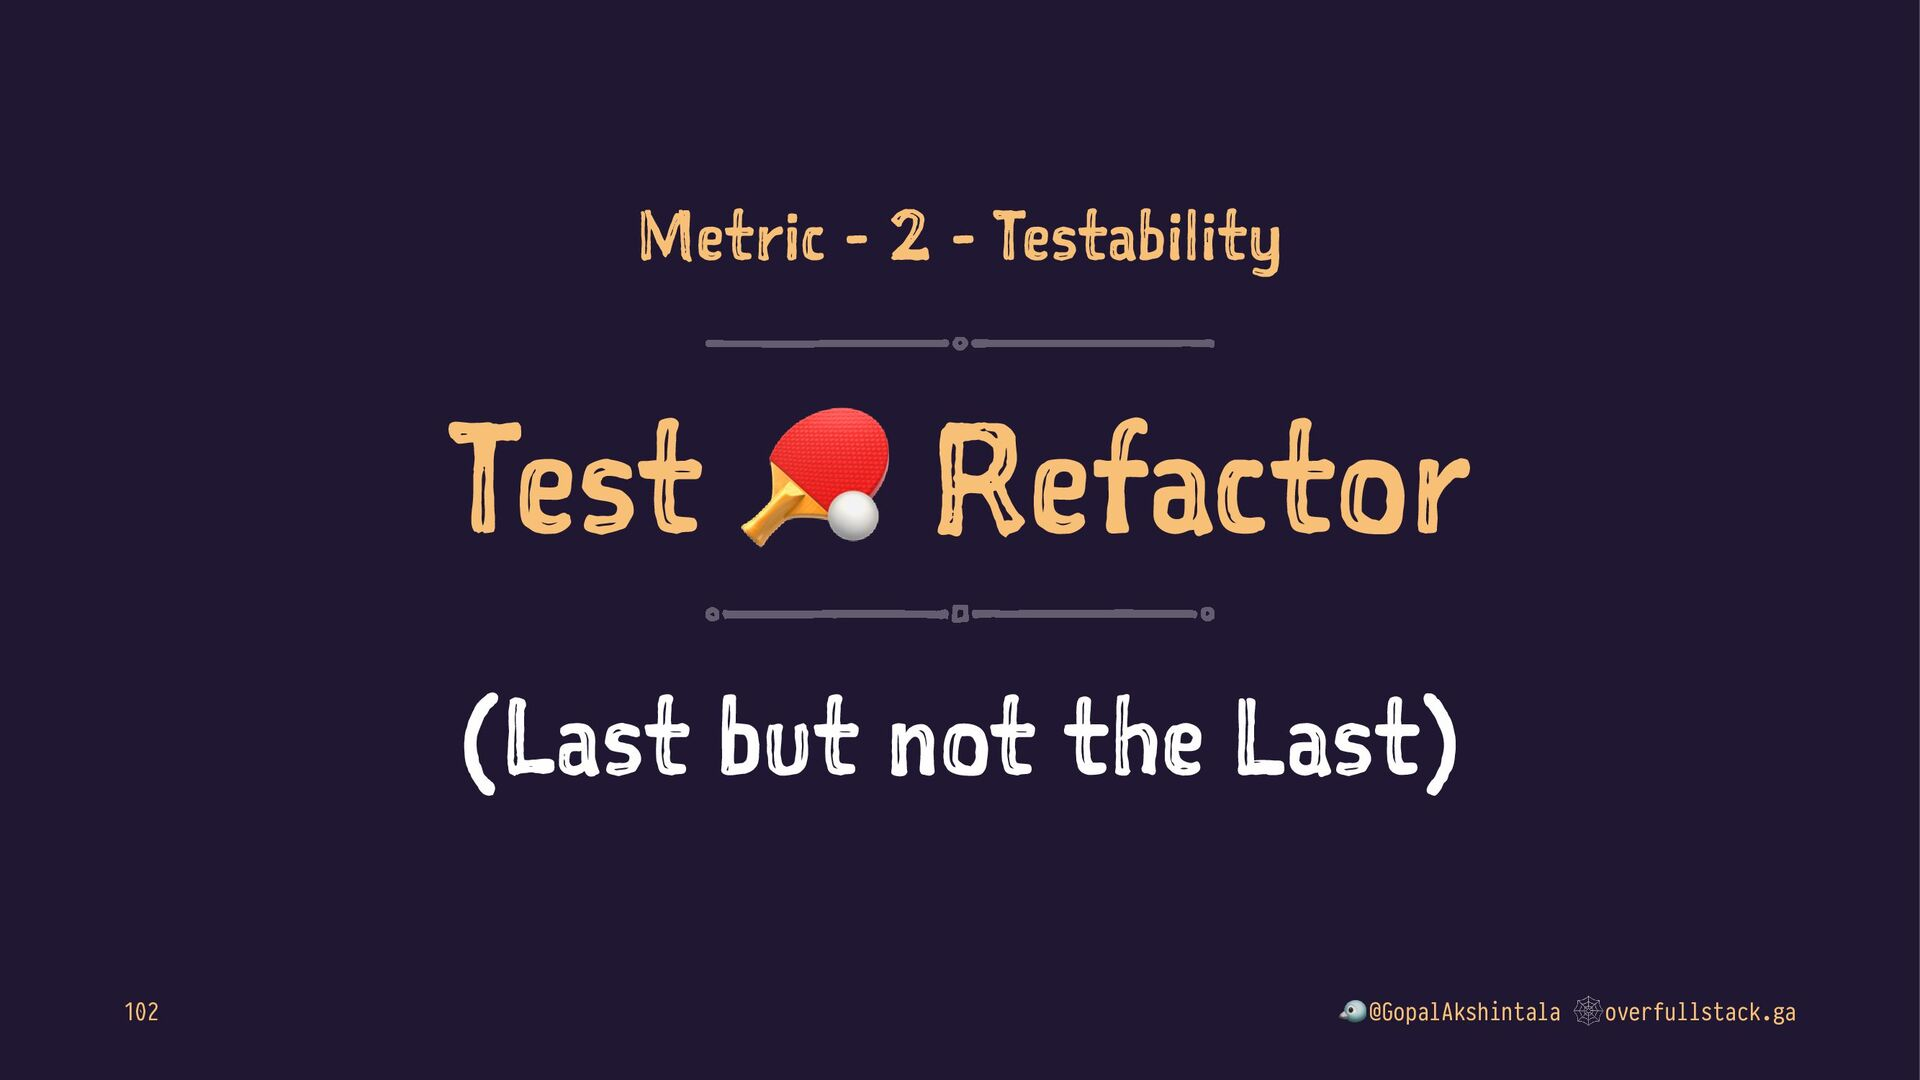 M tr c - 2 - T st bi it T st ! R fa to (L st ut...